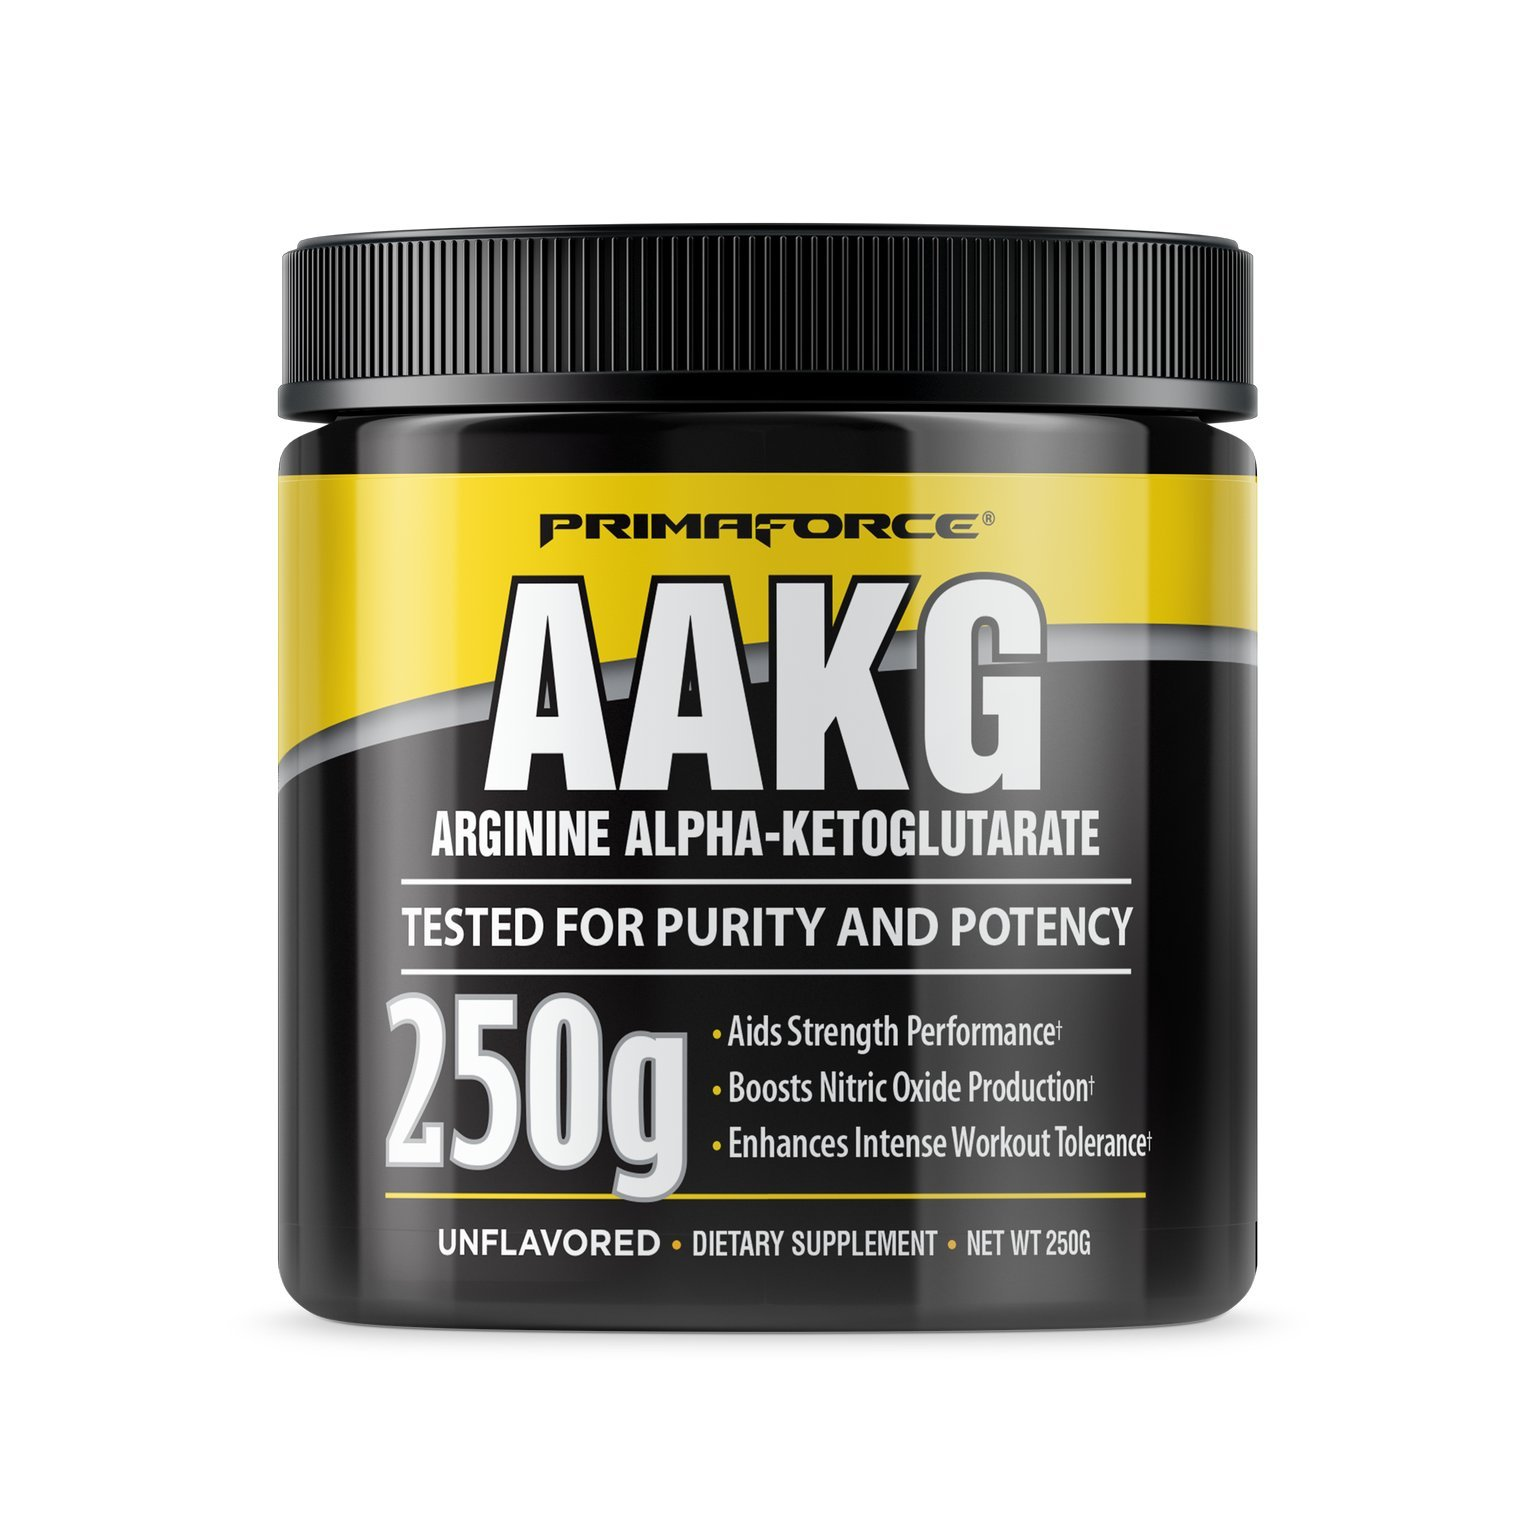 PrimaForce AAKG Powder Supplement,  250 Grams – Aids Strength Performance / Boosts Nitric Oxide Production / Enhances Intense Workout Tolerance